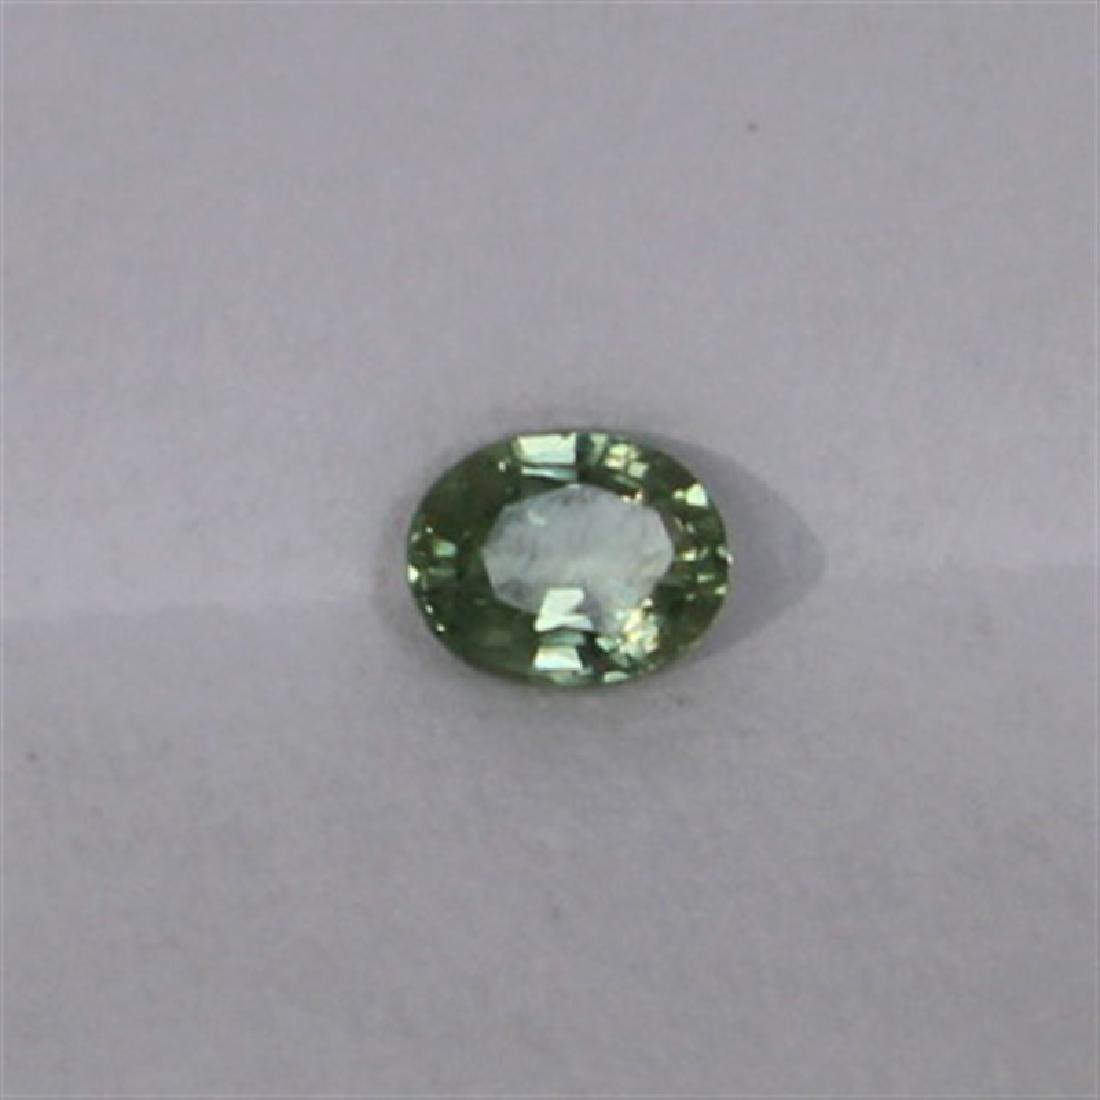 0.44ct Alexandrite oval cut